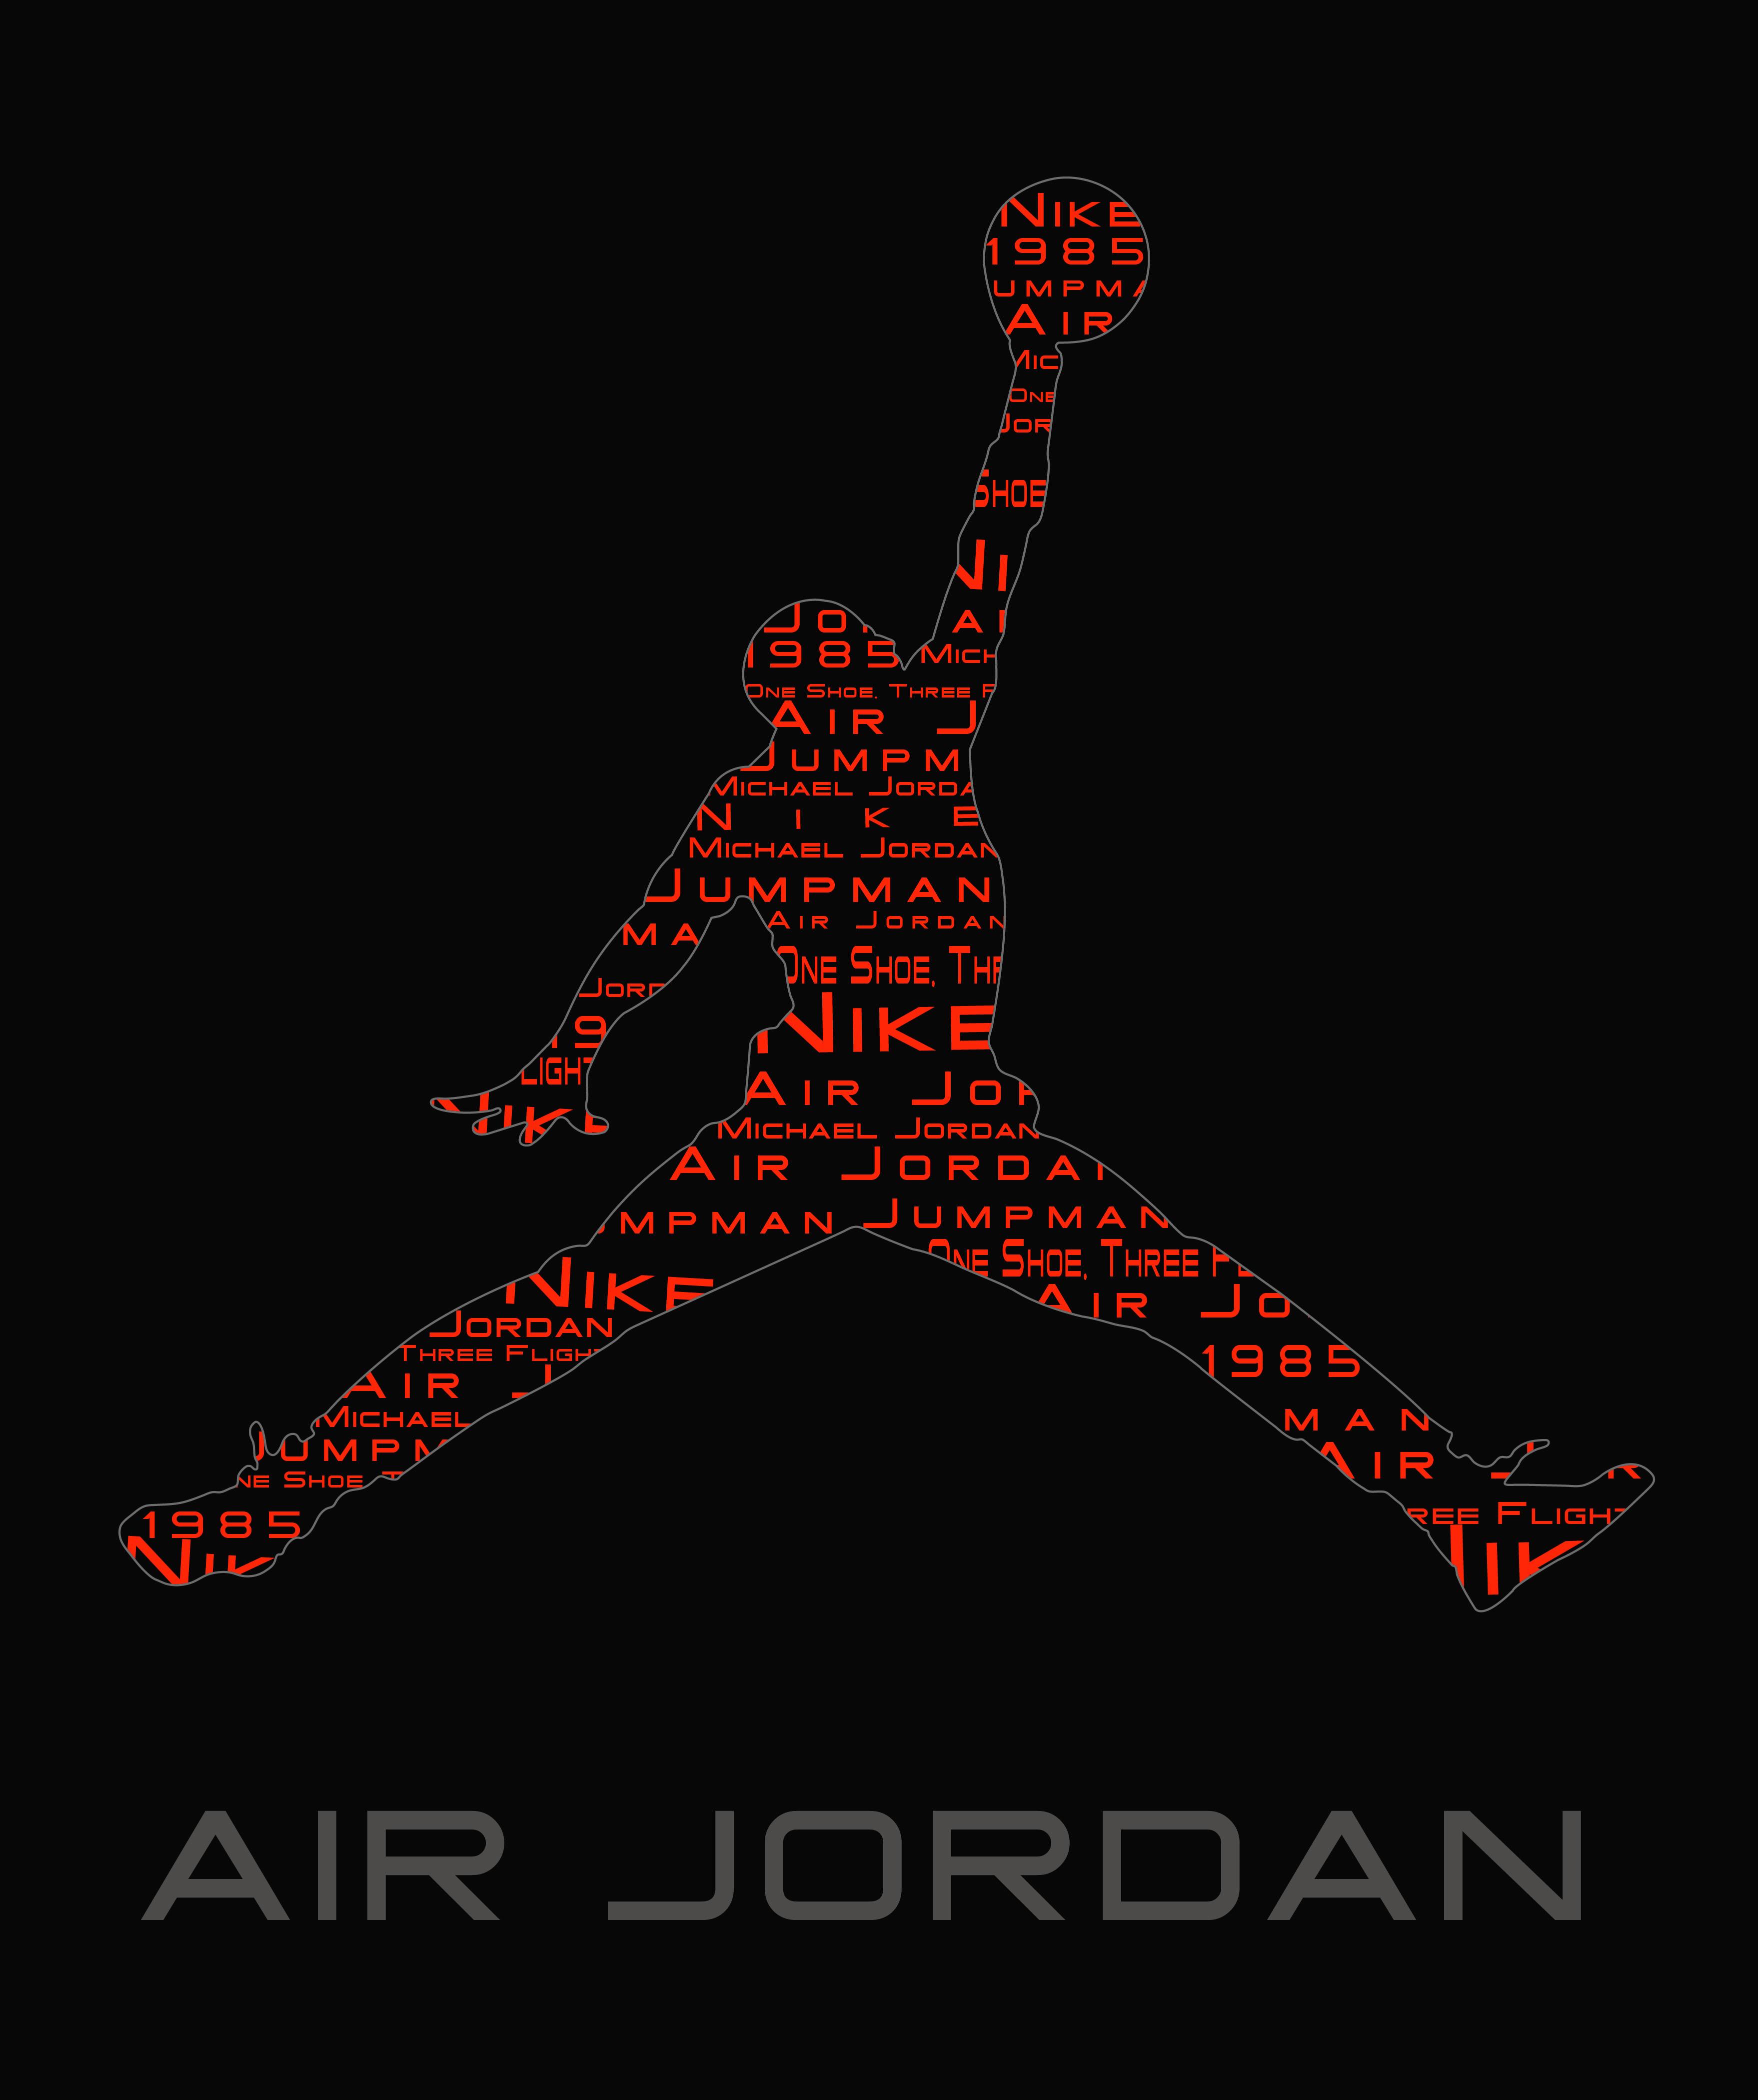 Jordan symbol air jordan symbol voltagebd Choice Image